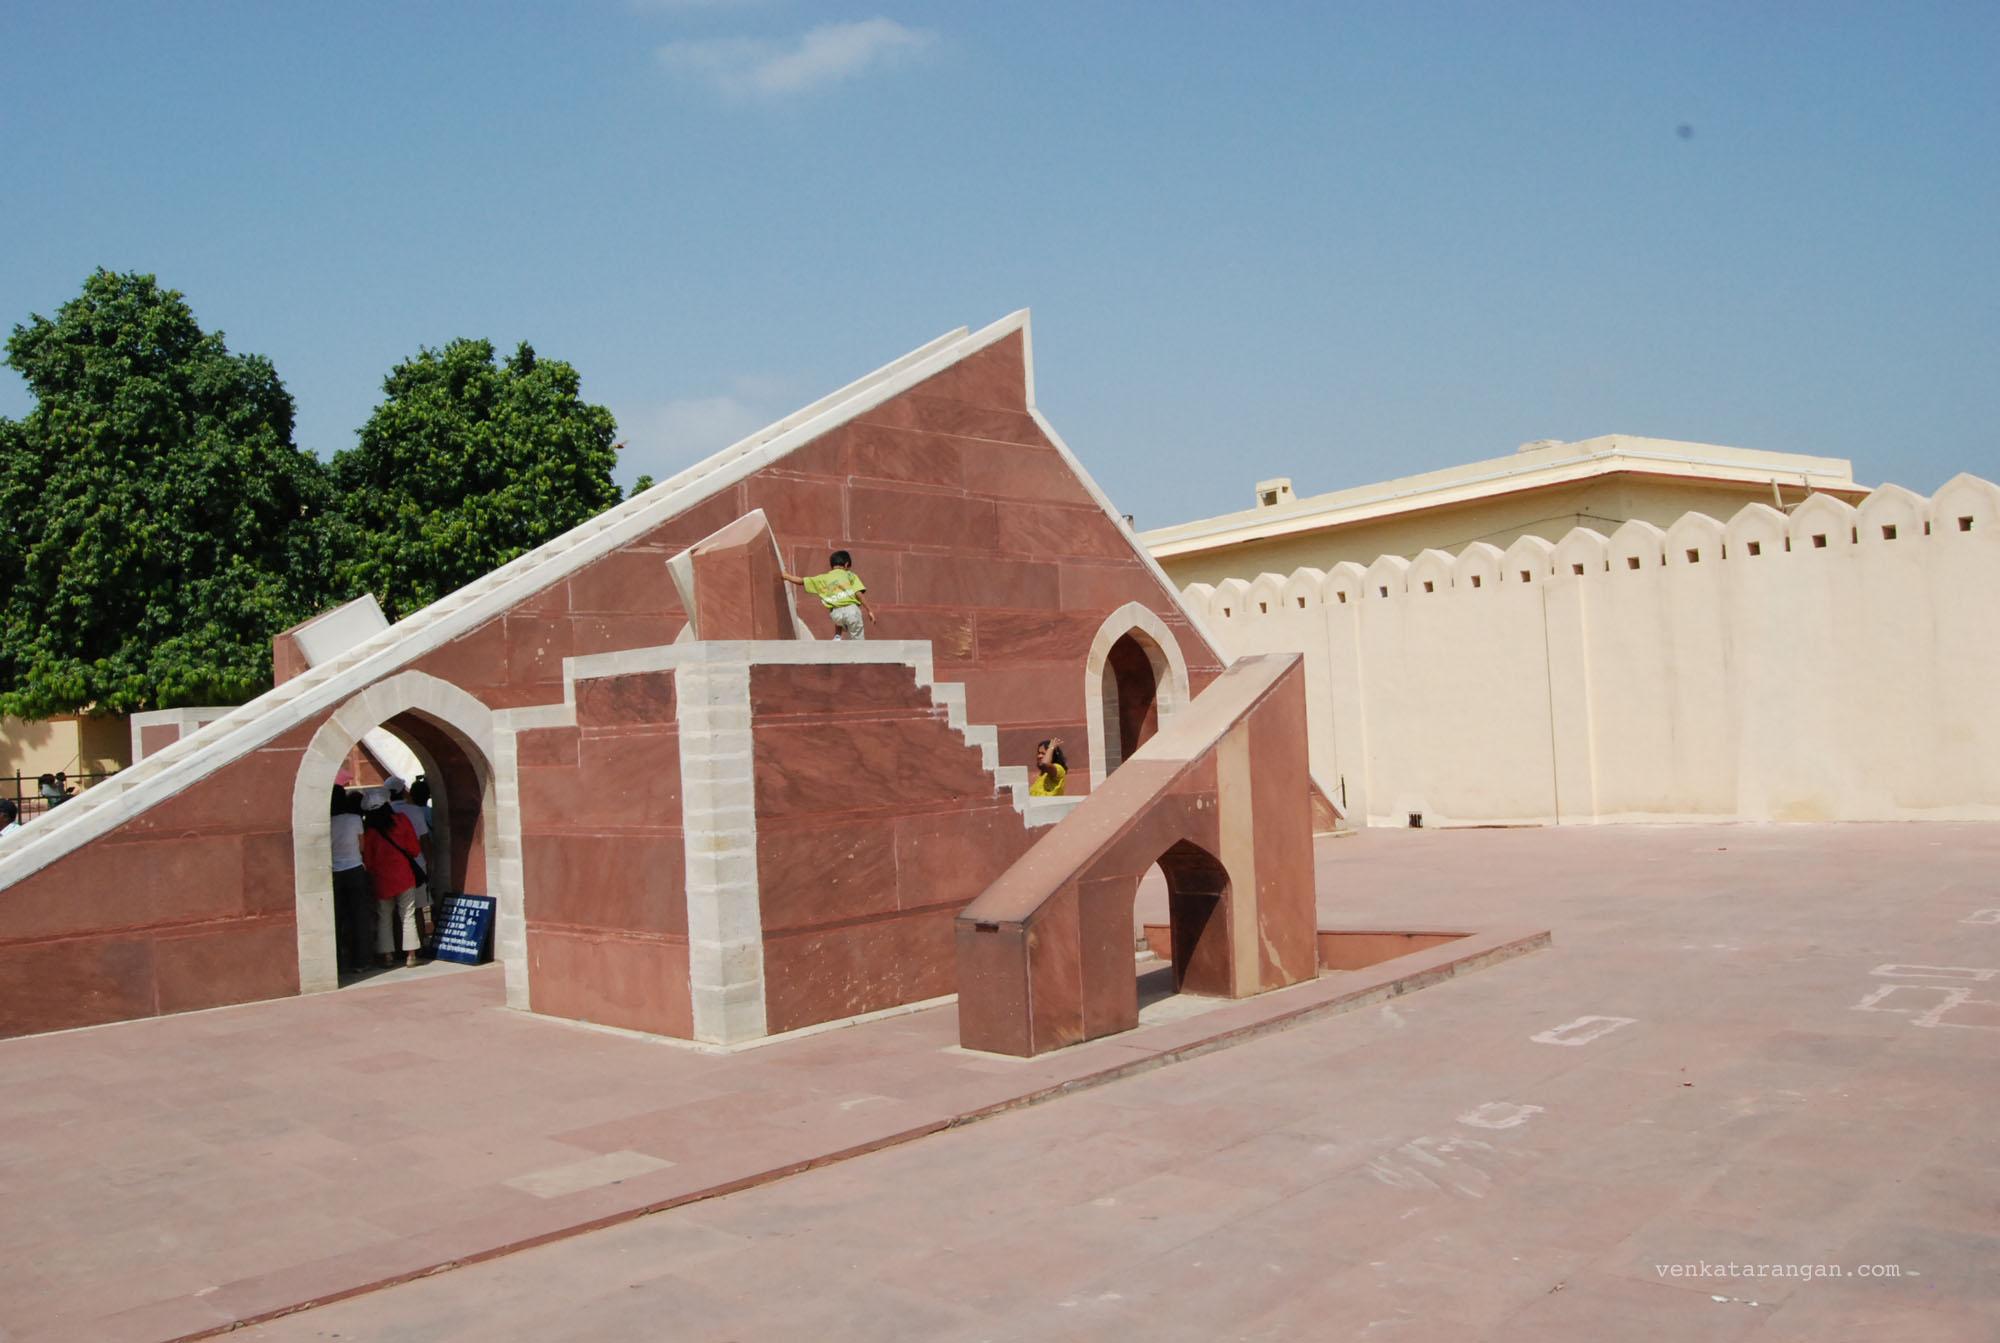 Laghu Samrat Yantra (the smaller sundial at the monument)